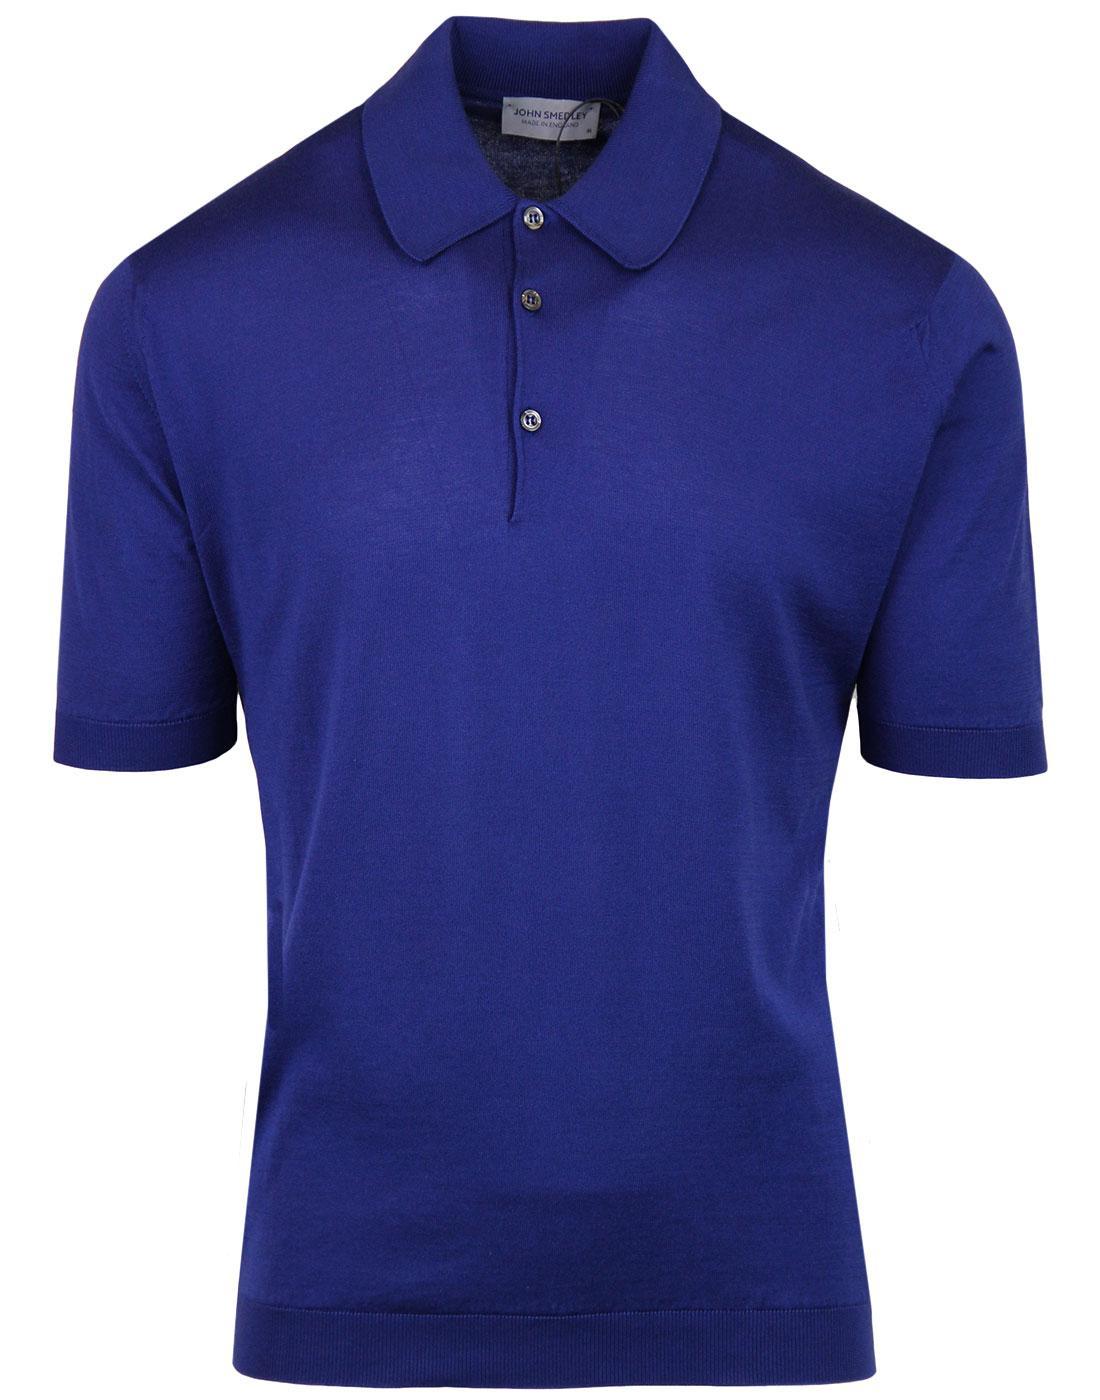 Isis JOHN SMEDLEY Classic Fit Mod Polo Shirt SERGE